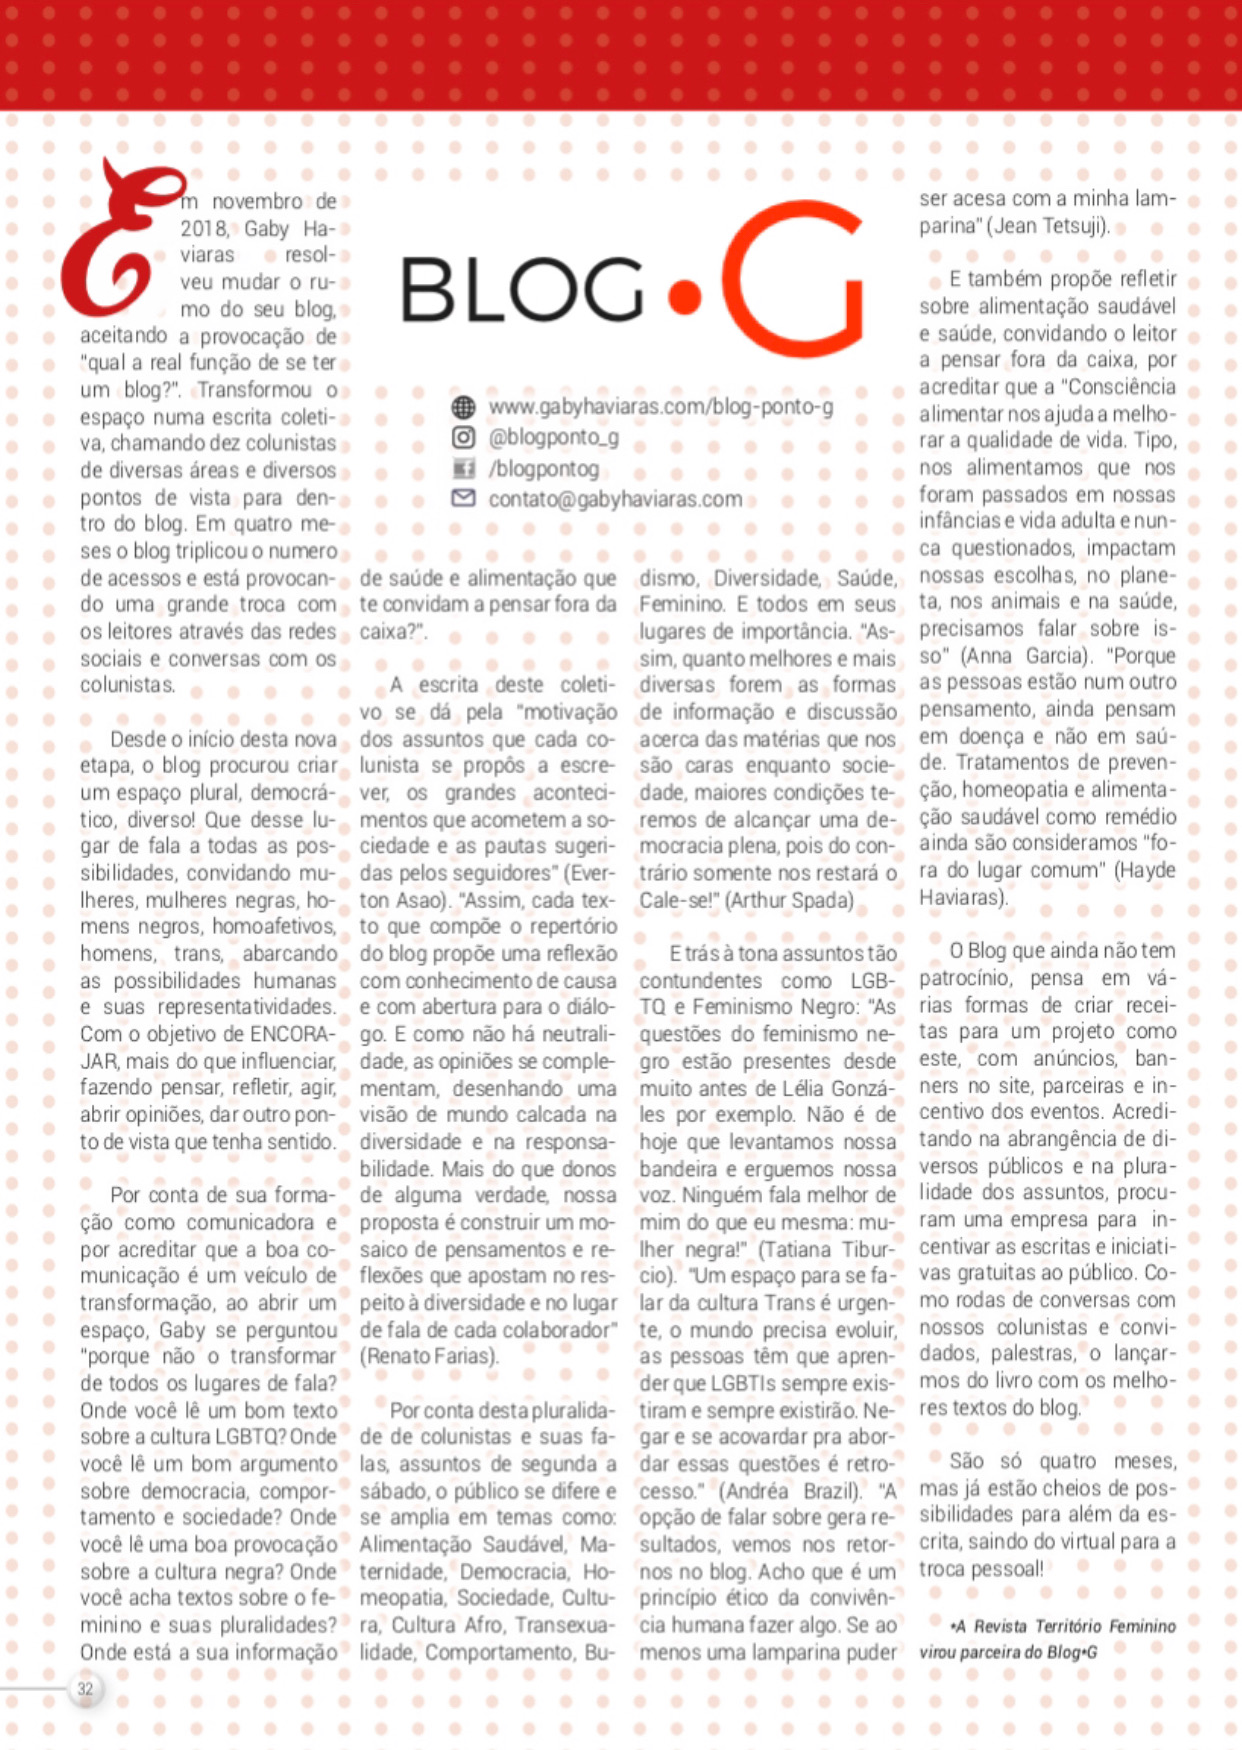 REVISTA TERRITORIO FEMININO - ABRIL 2019